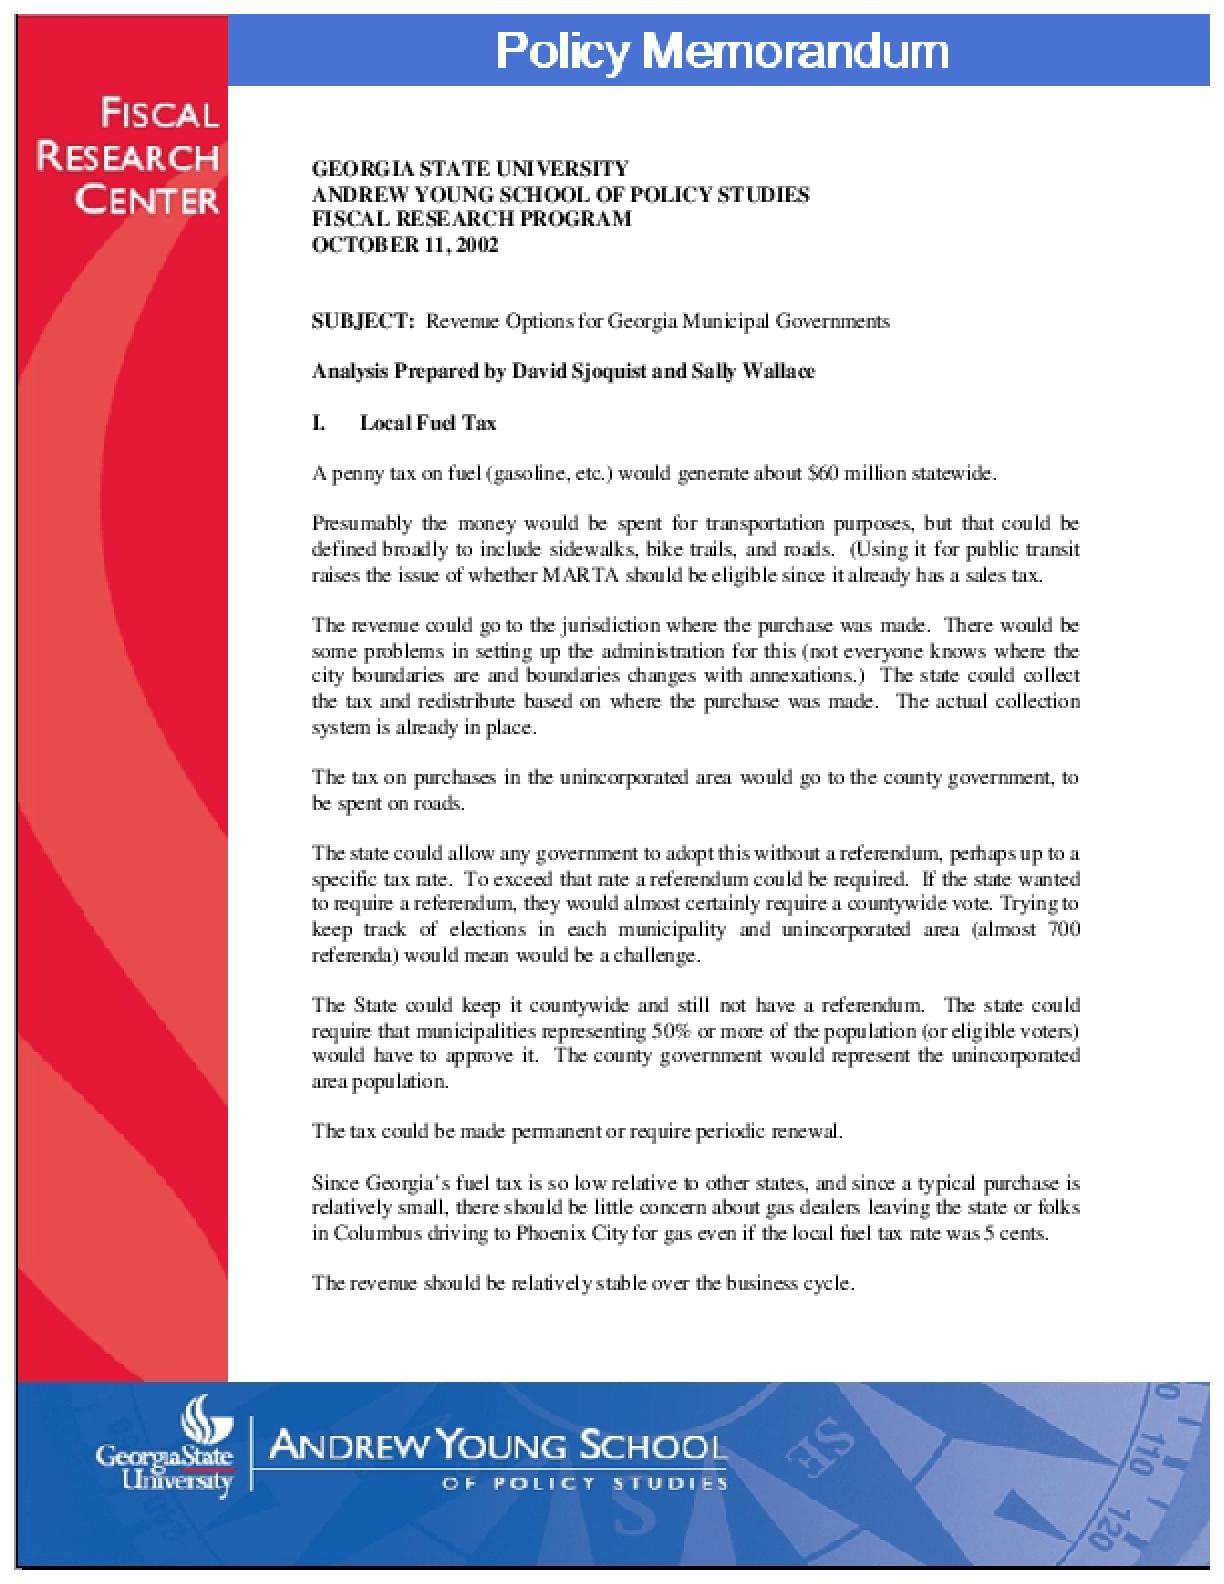 Revenue Options for Georgia Municipal Governments